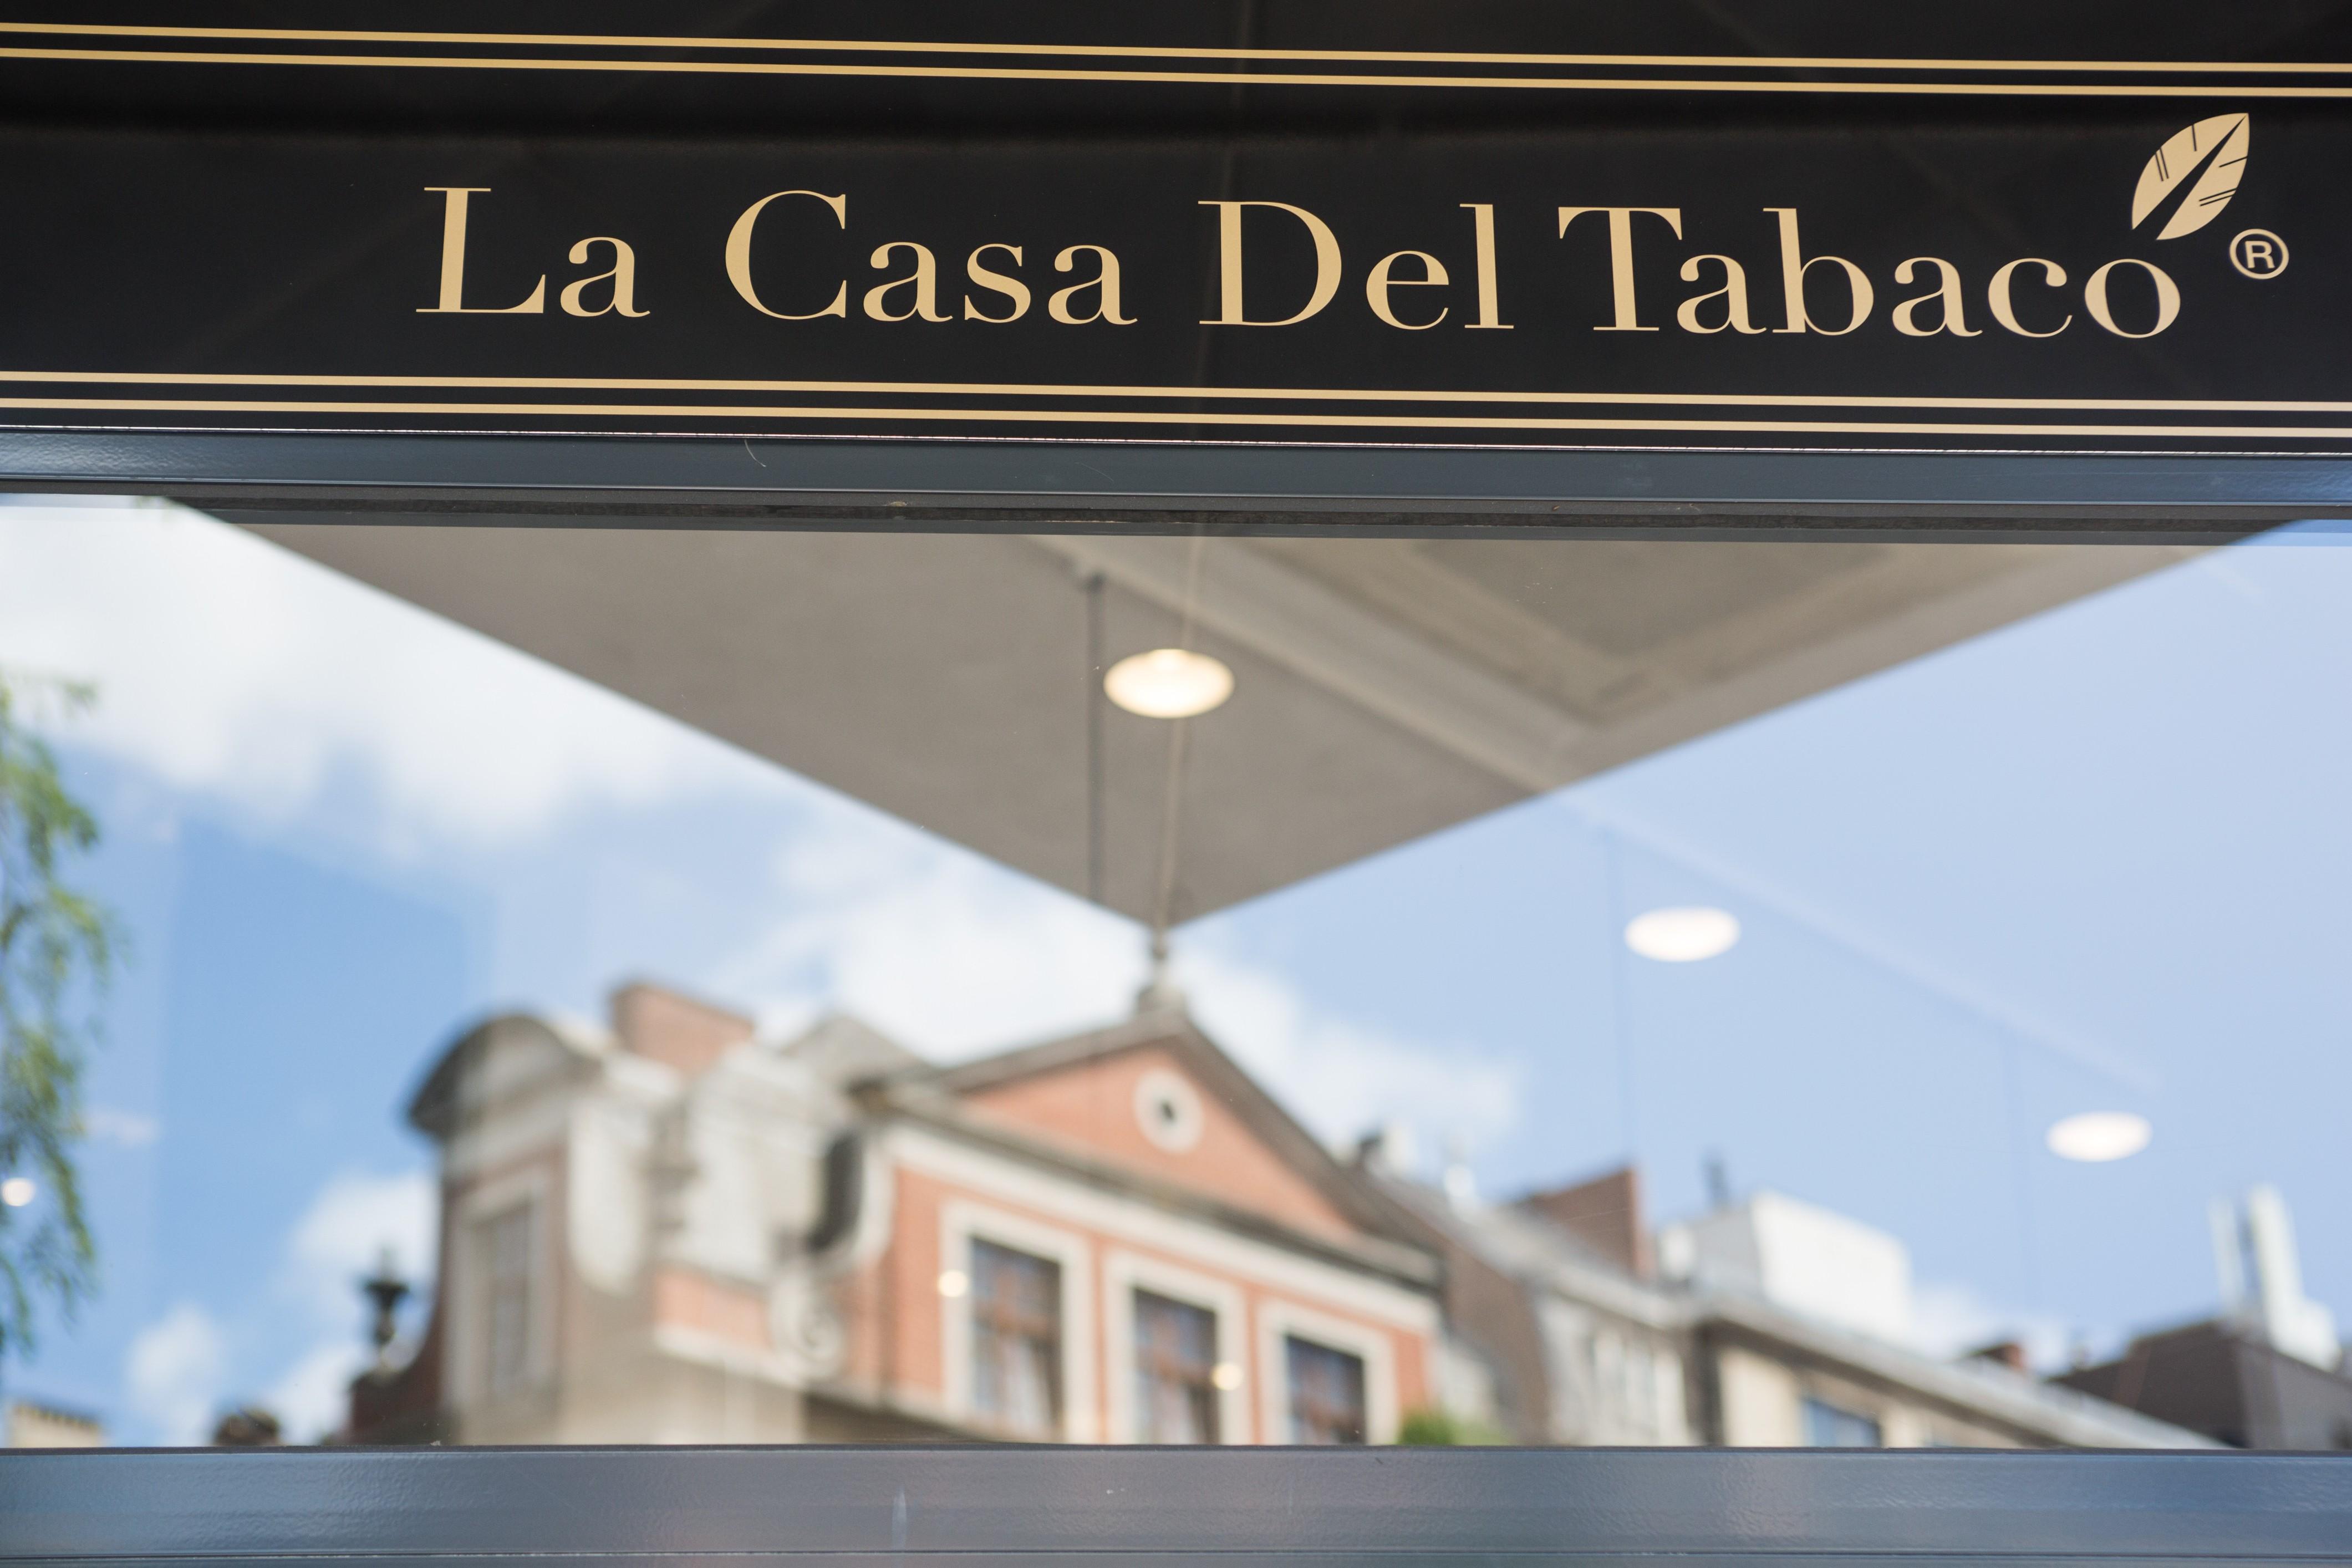 La Casa Del Tabaco Group | LinkedIn